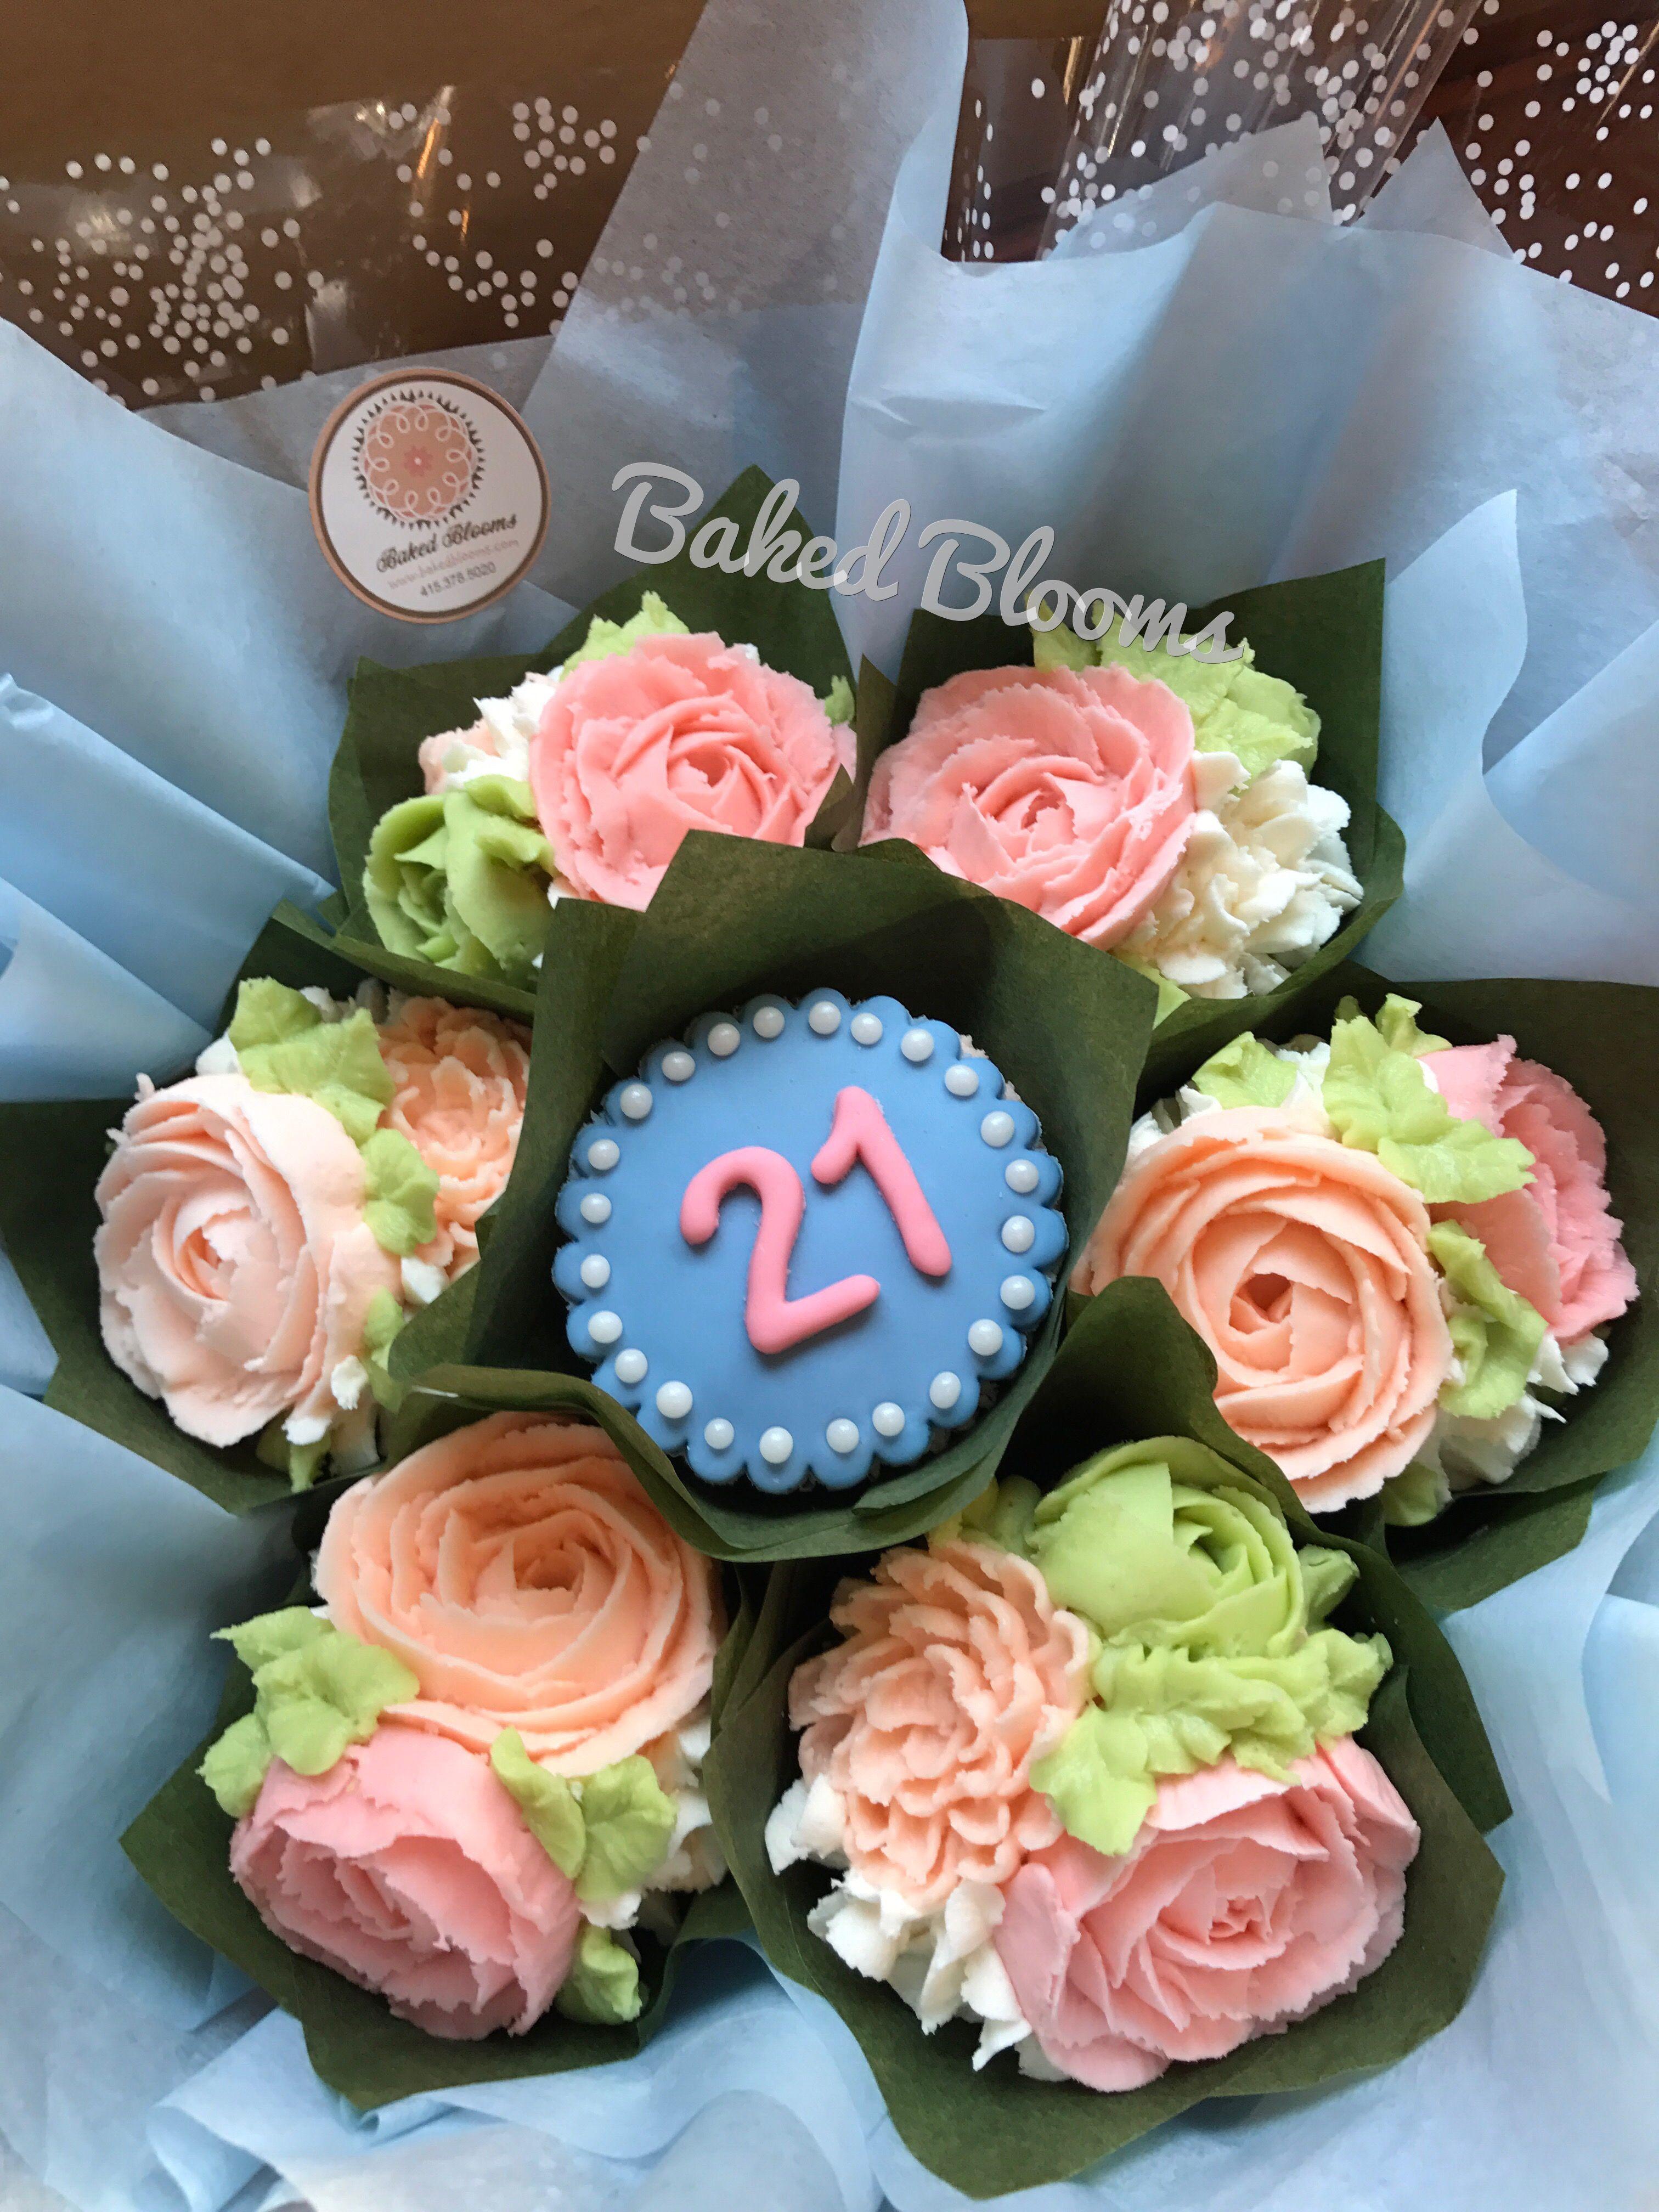 Elegant 21st birthday bouquet www.bakedblooms.com   Baked Blooms ...